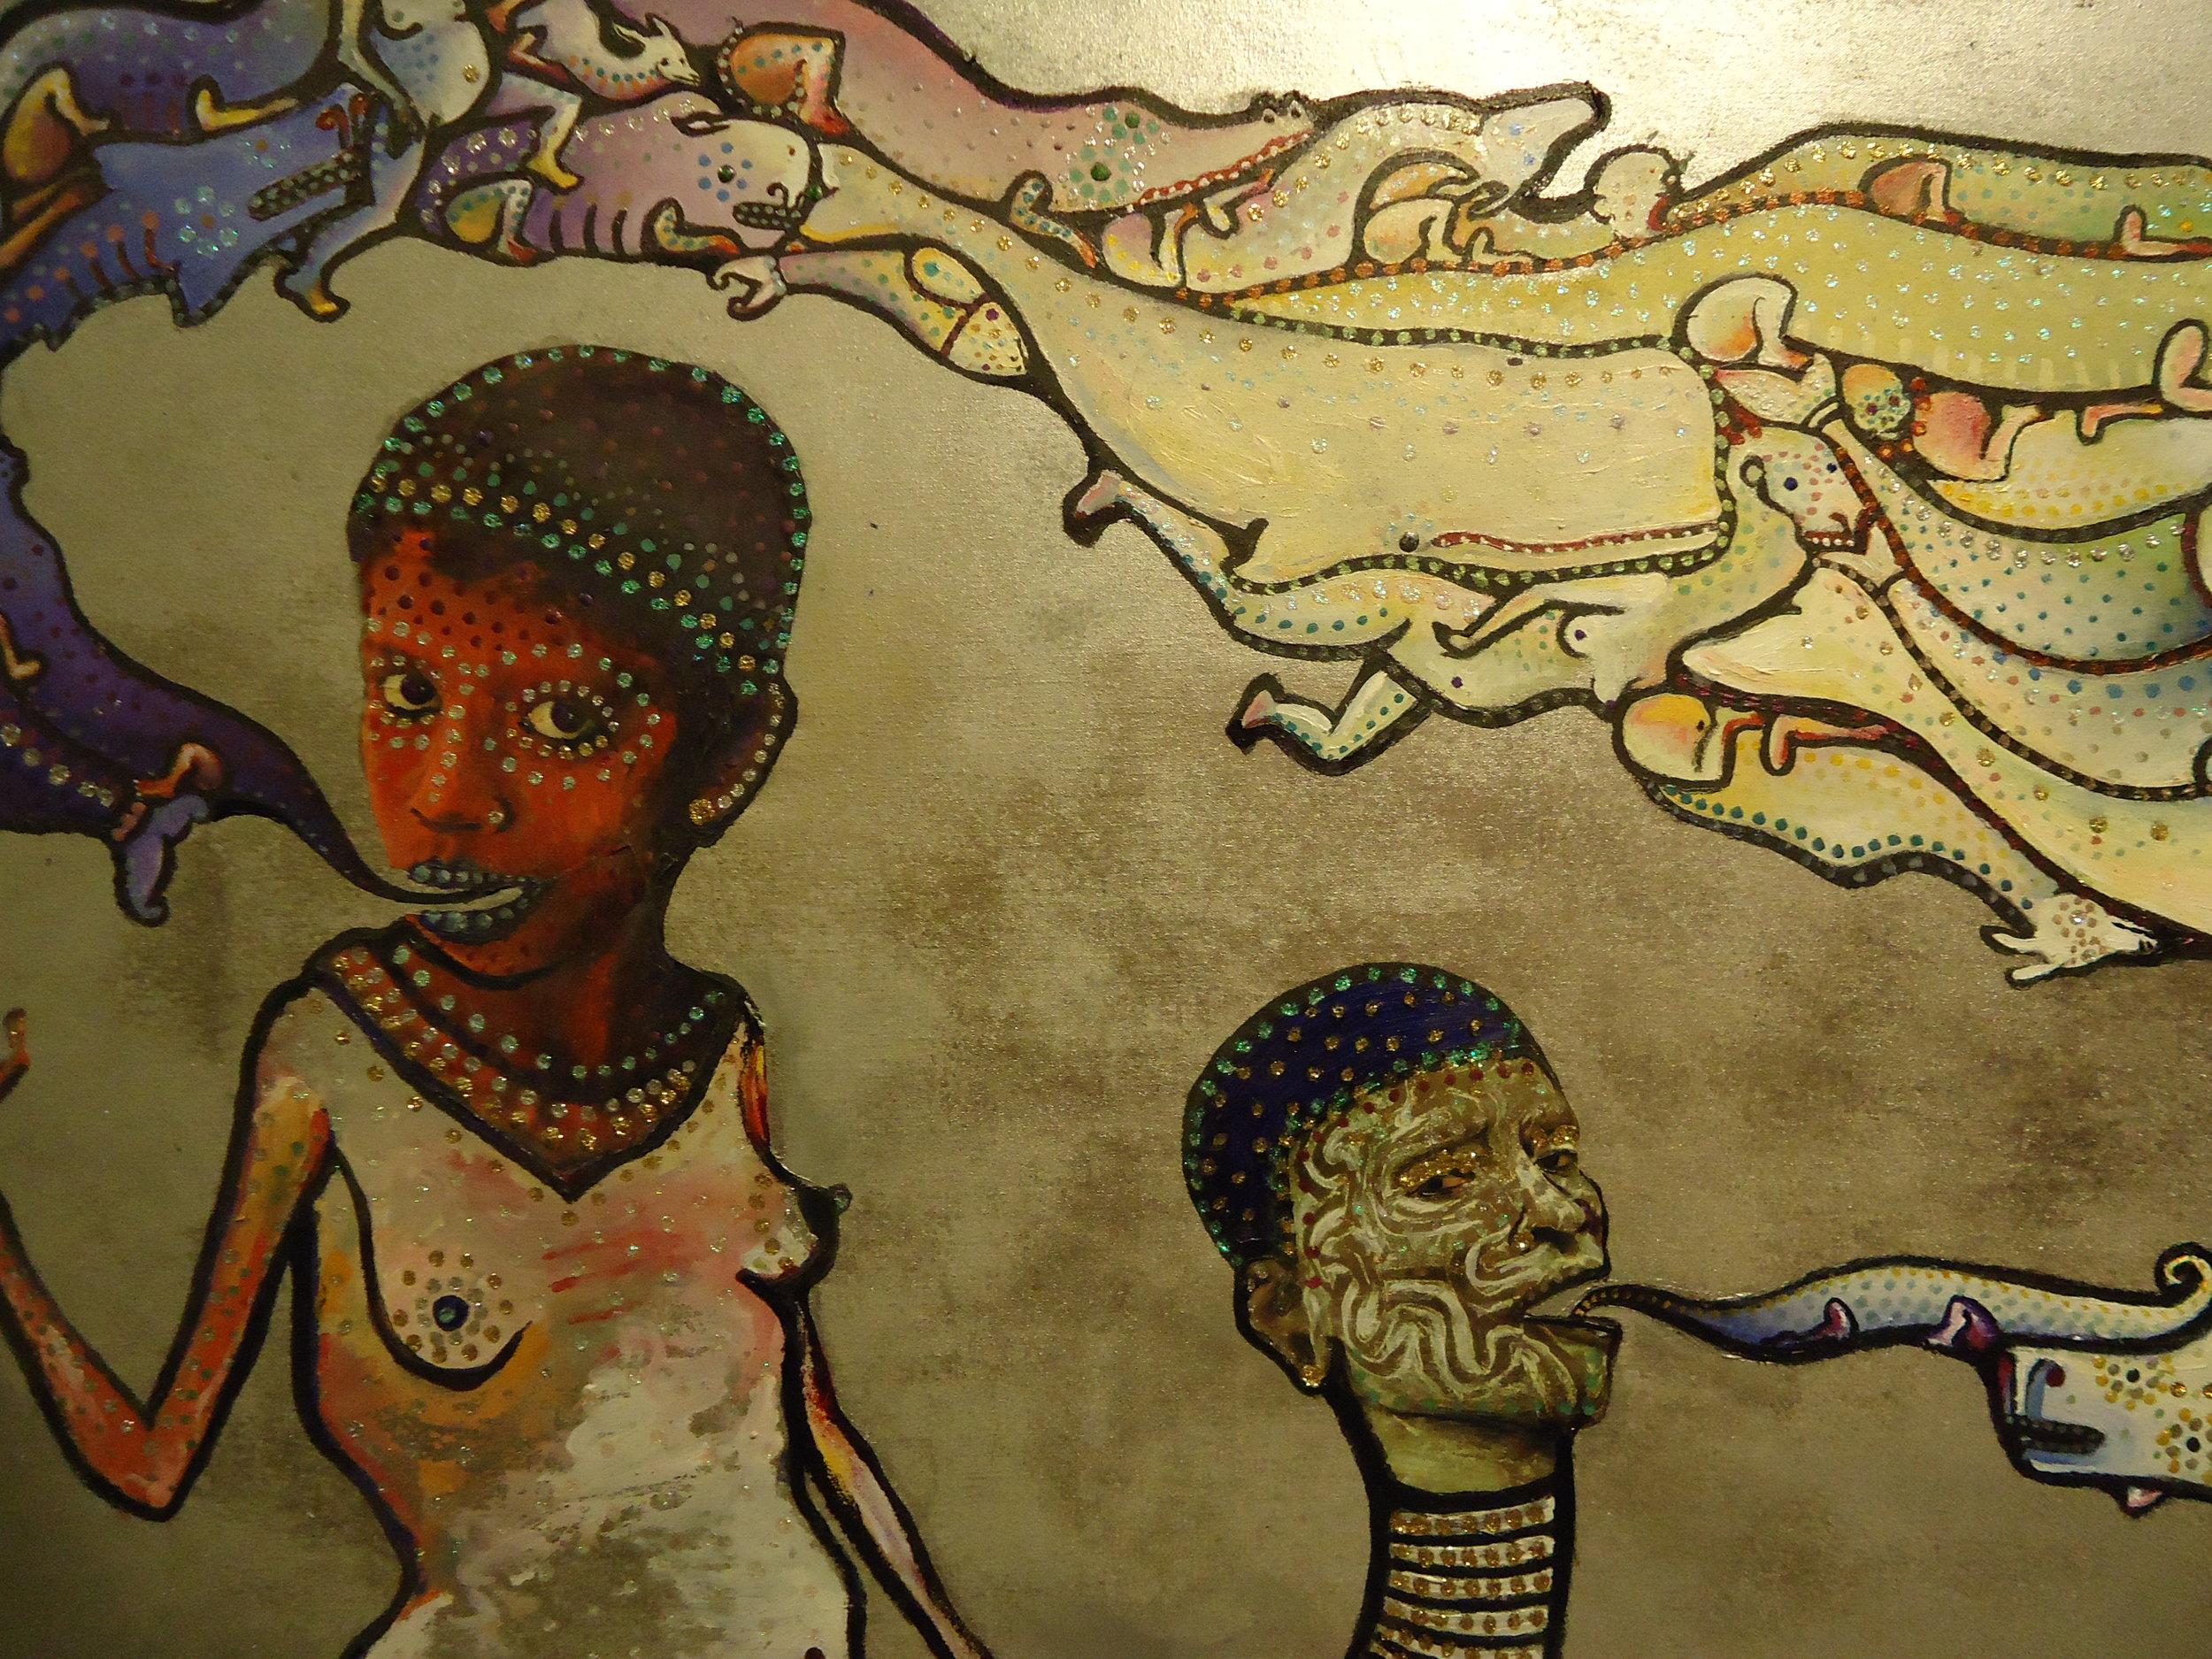 ouroboros-art-painting-jason-borders.jpg